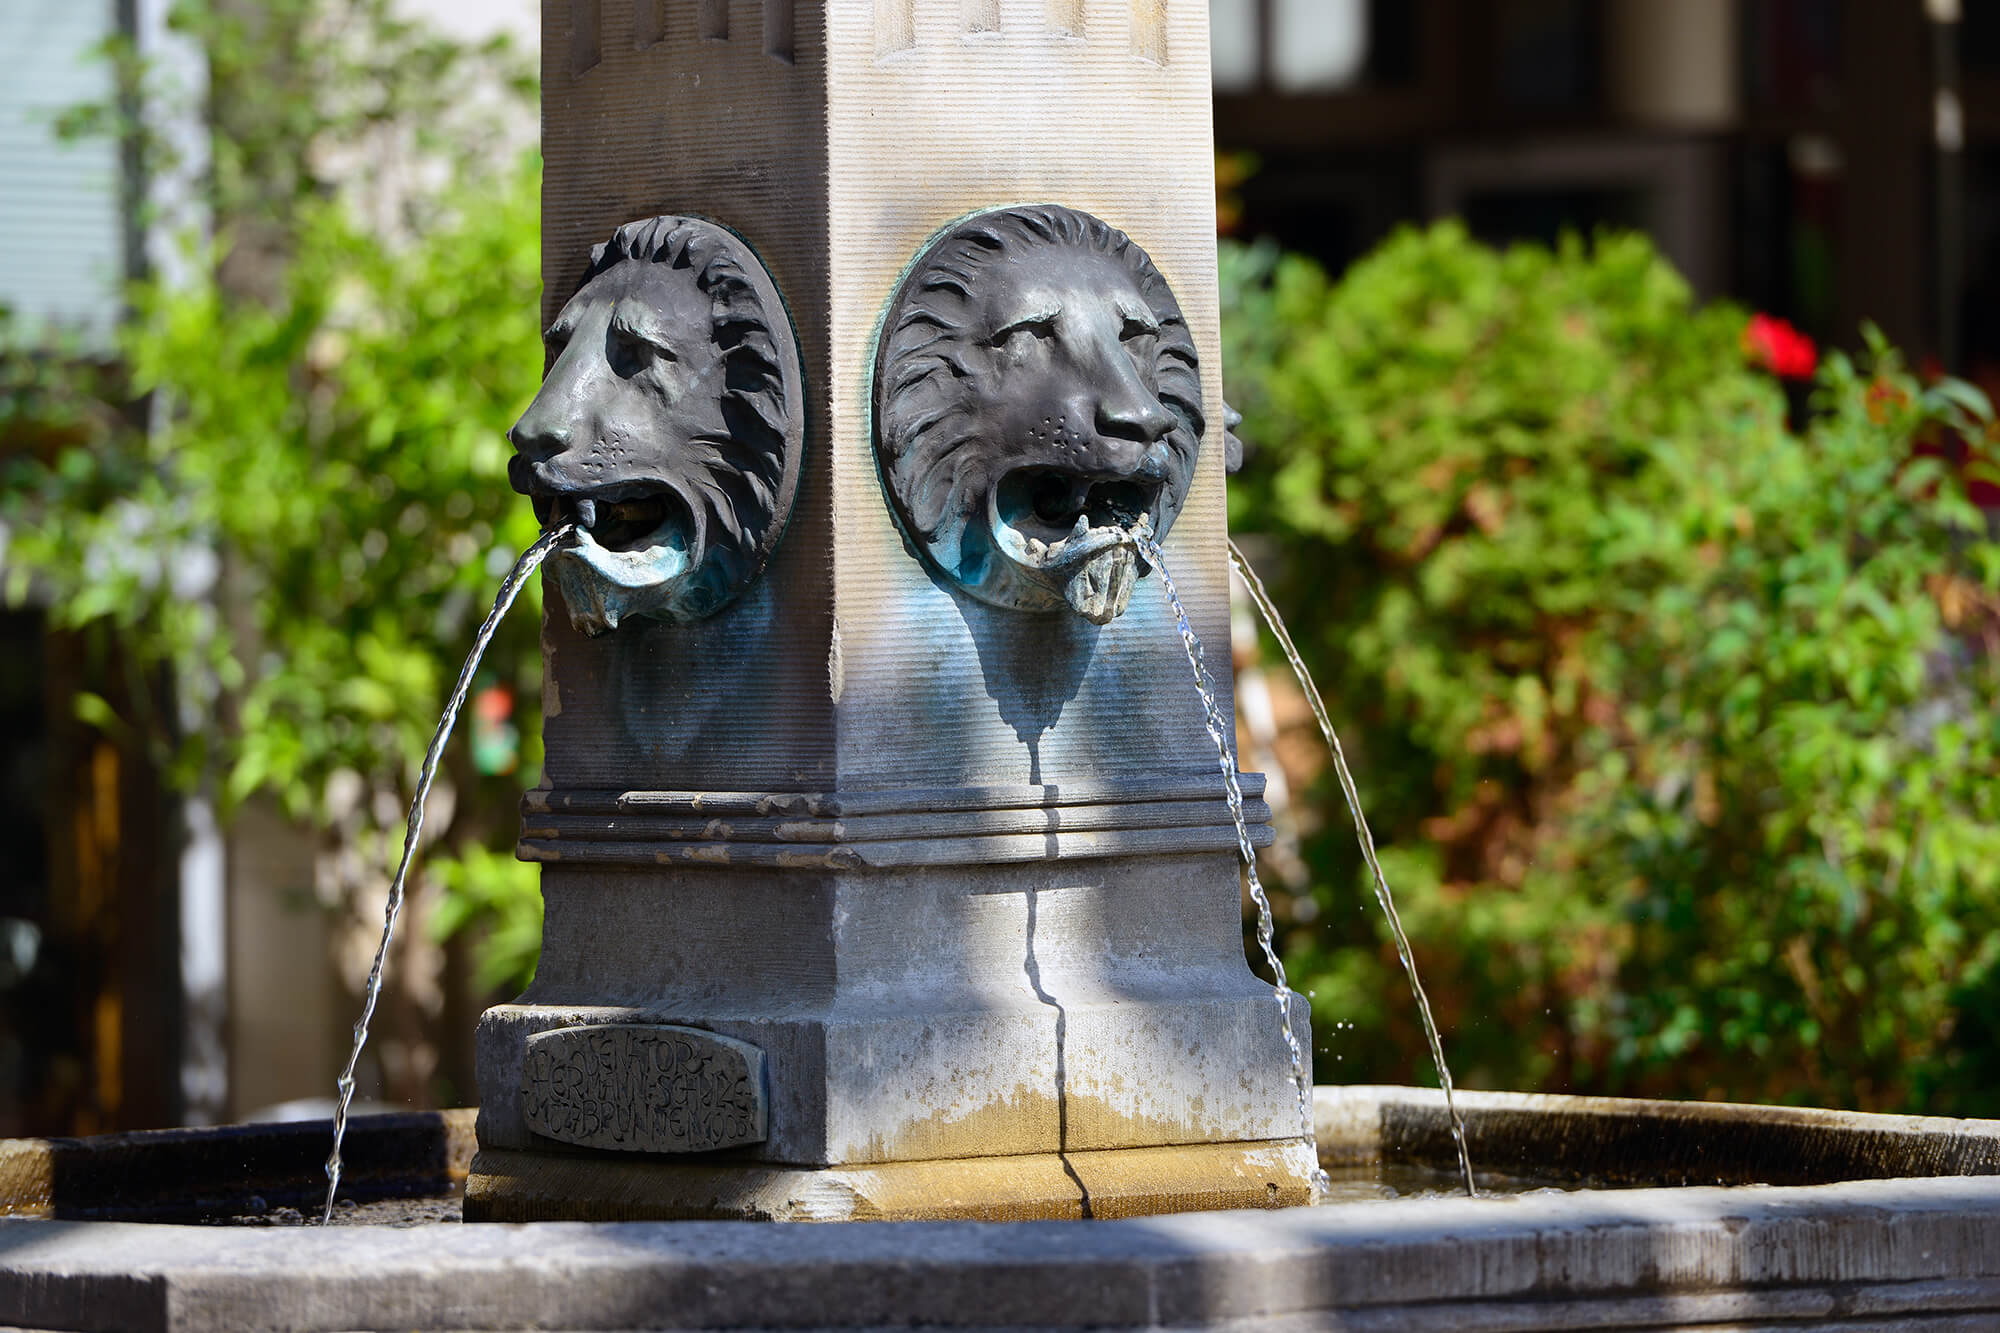 Brunnen am Marktplatz Gifhorn.jpg